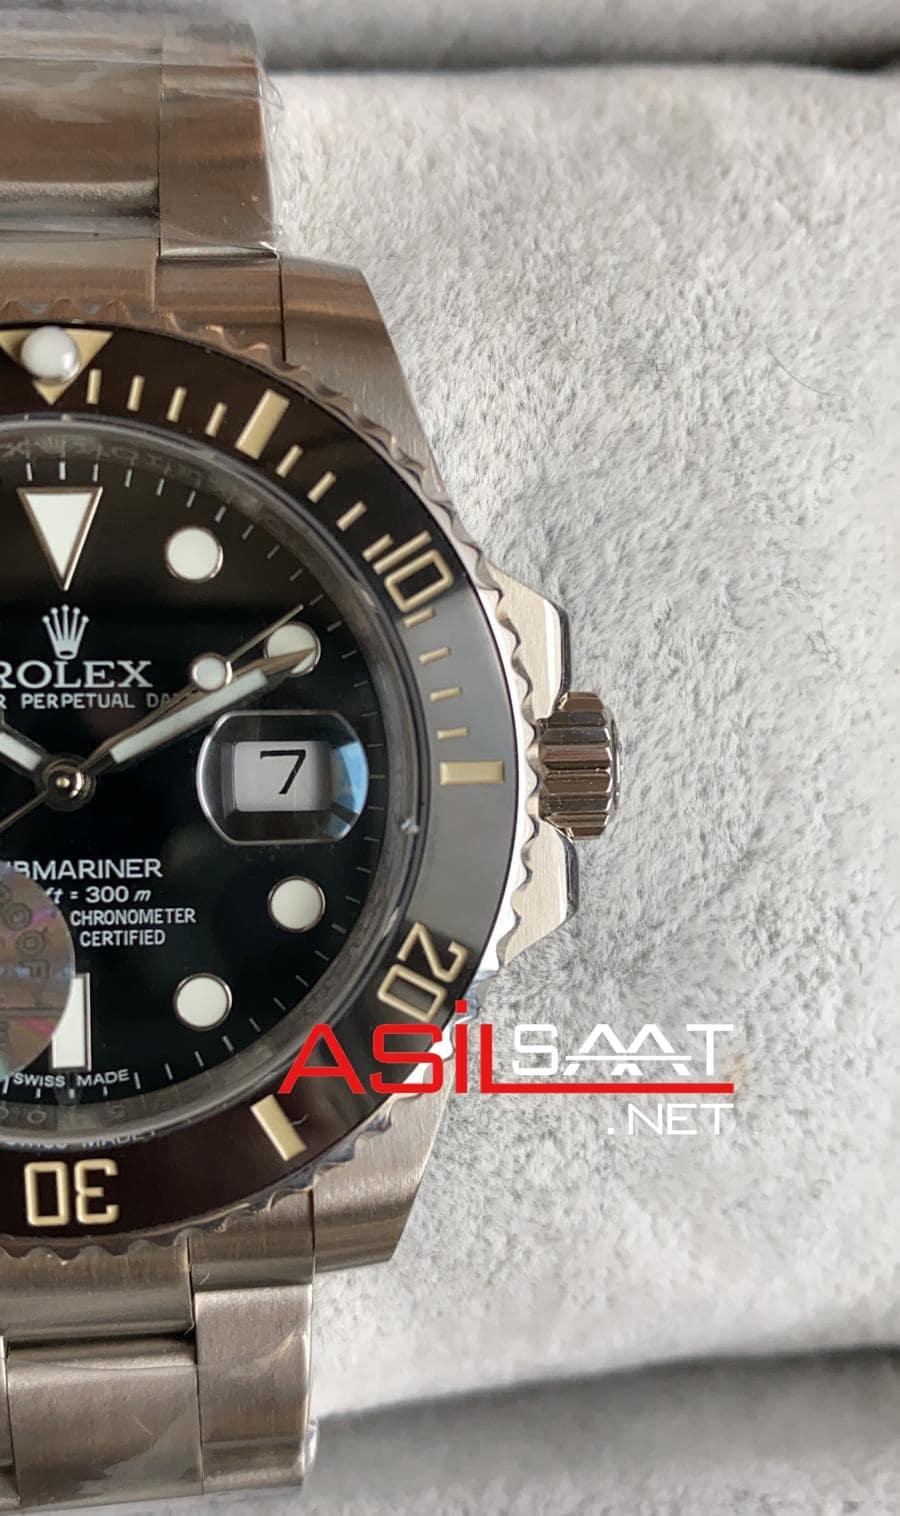 Rolex Oyster Perpetual Submariner Silver Replika Saat ROLS001